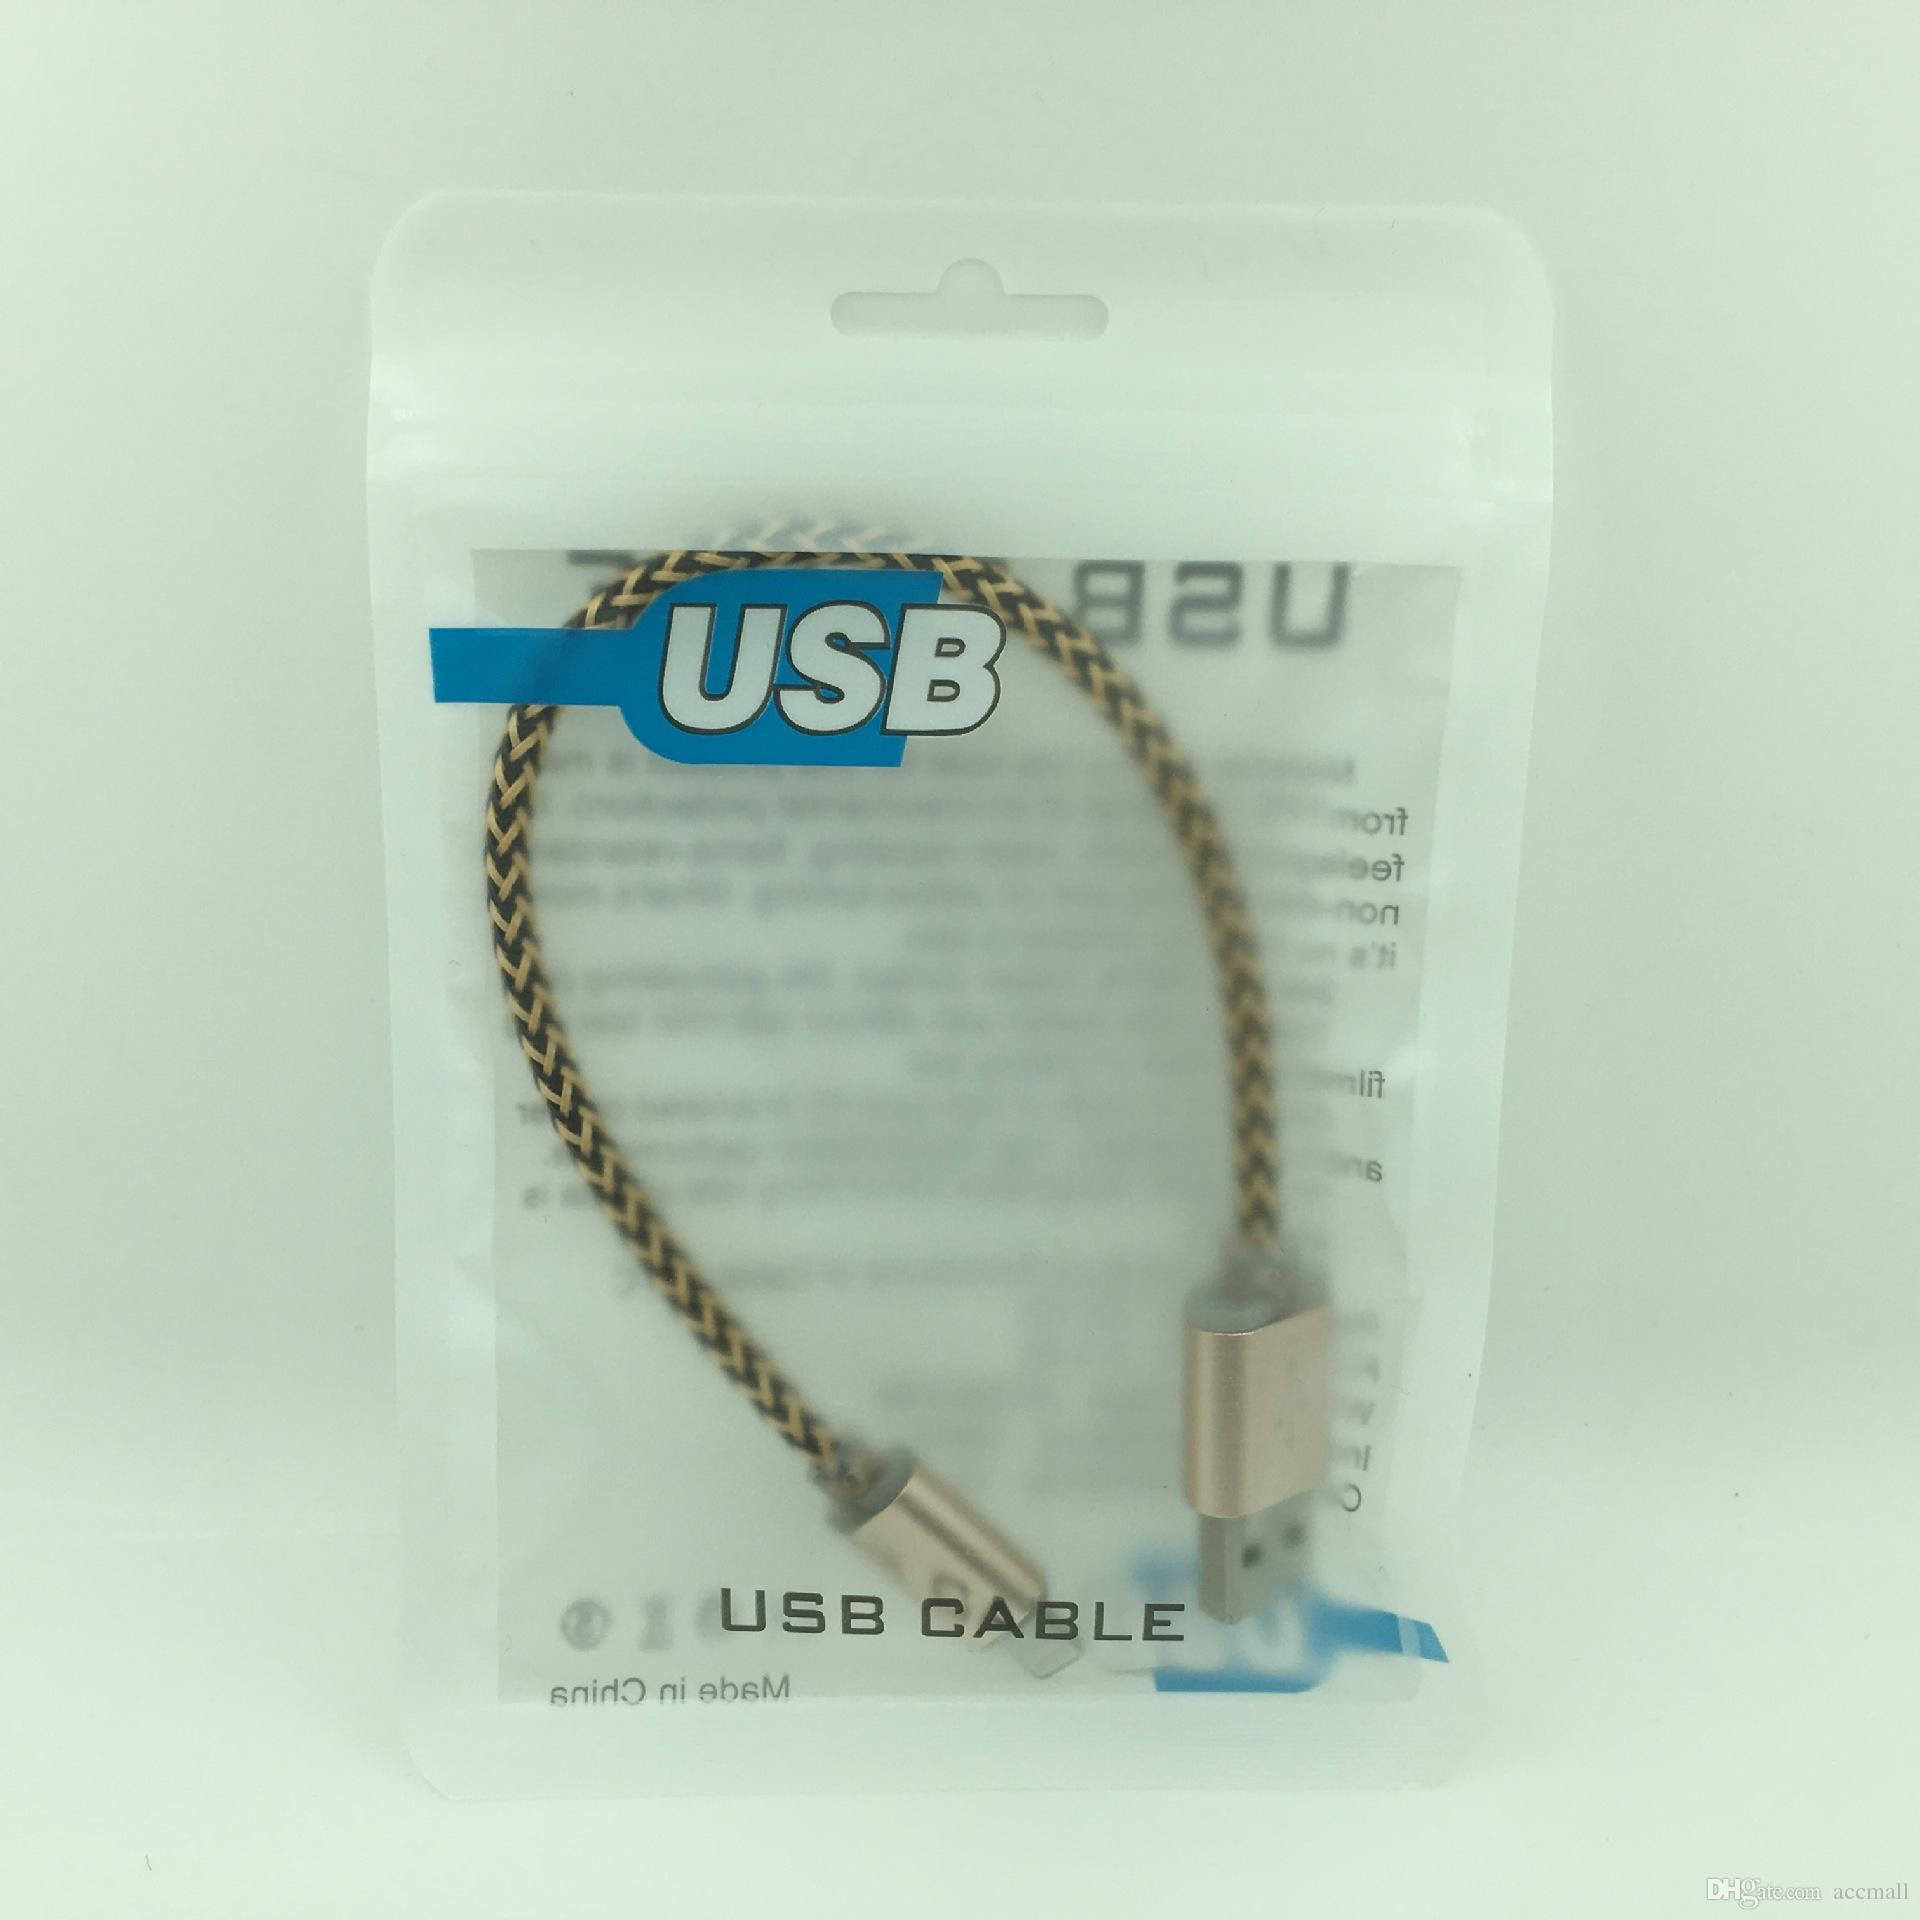 USB de plástico con cremallera paquete al por menor Bolsa de Poly PP cargador iPhone Cable Para 6 7 8 Plus X XR XS 11 Samsung Galaxy Nota 10 S10 S10e bolsas de embalaje